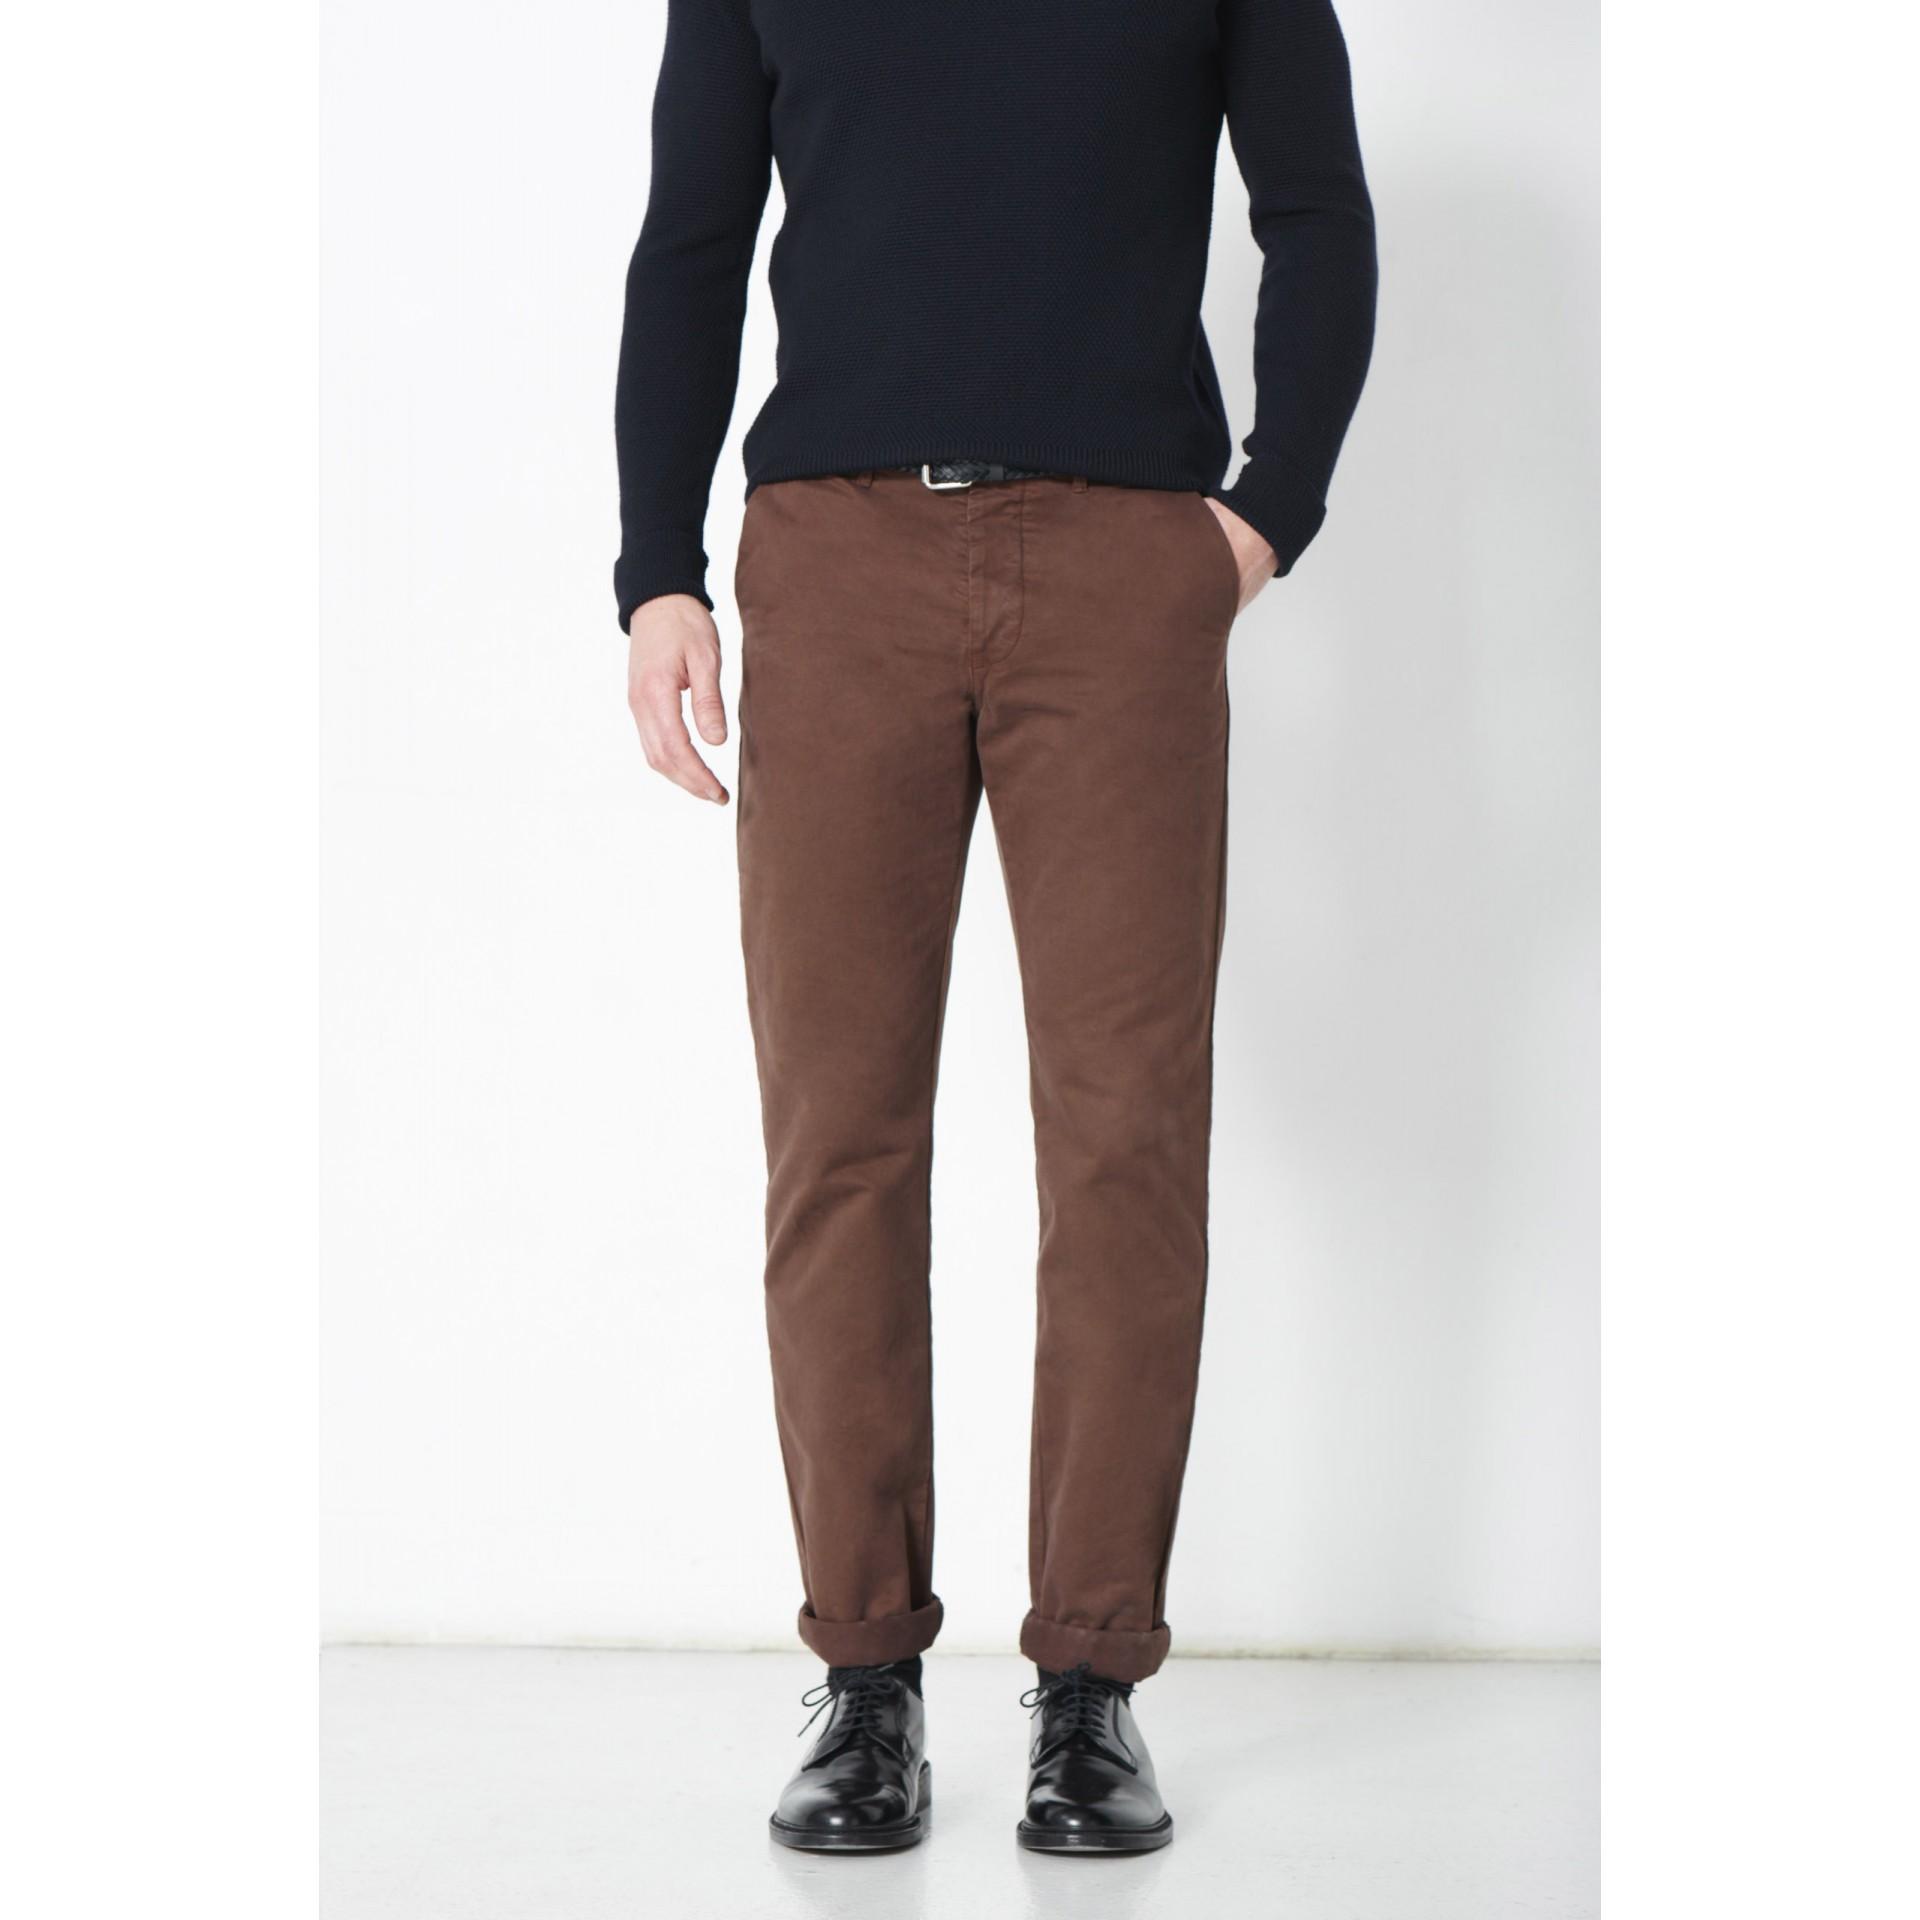 pantalon-chino-paul-noisette'.jpg